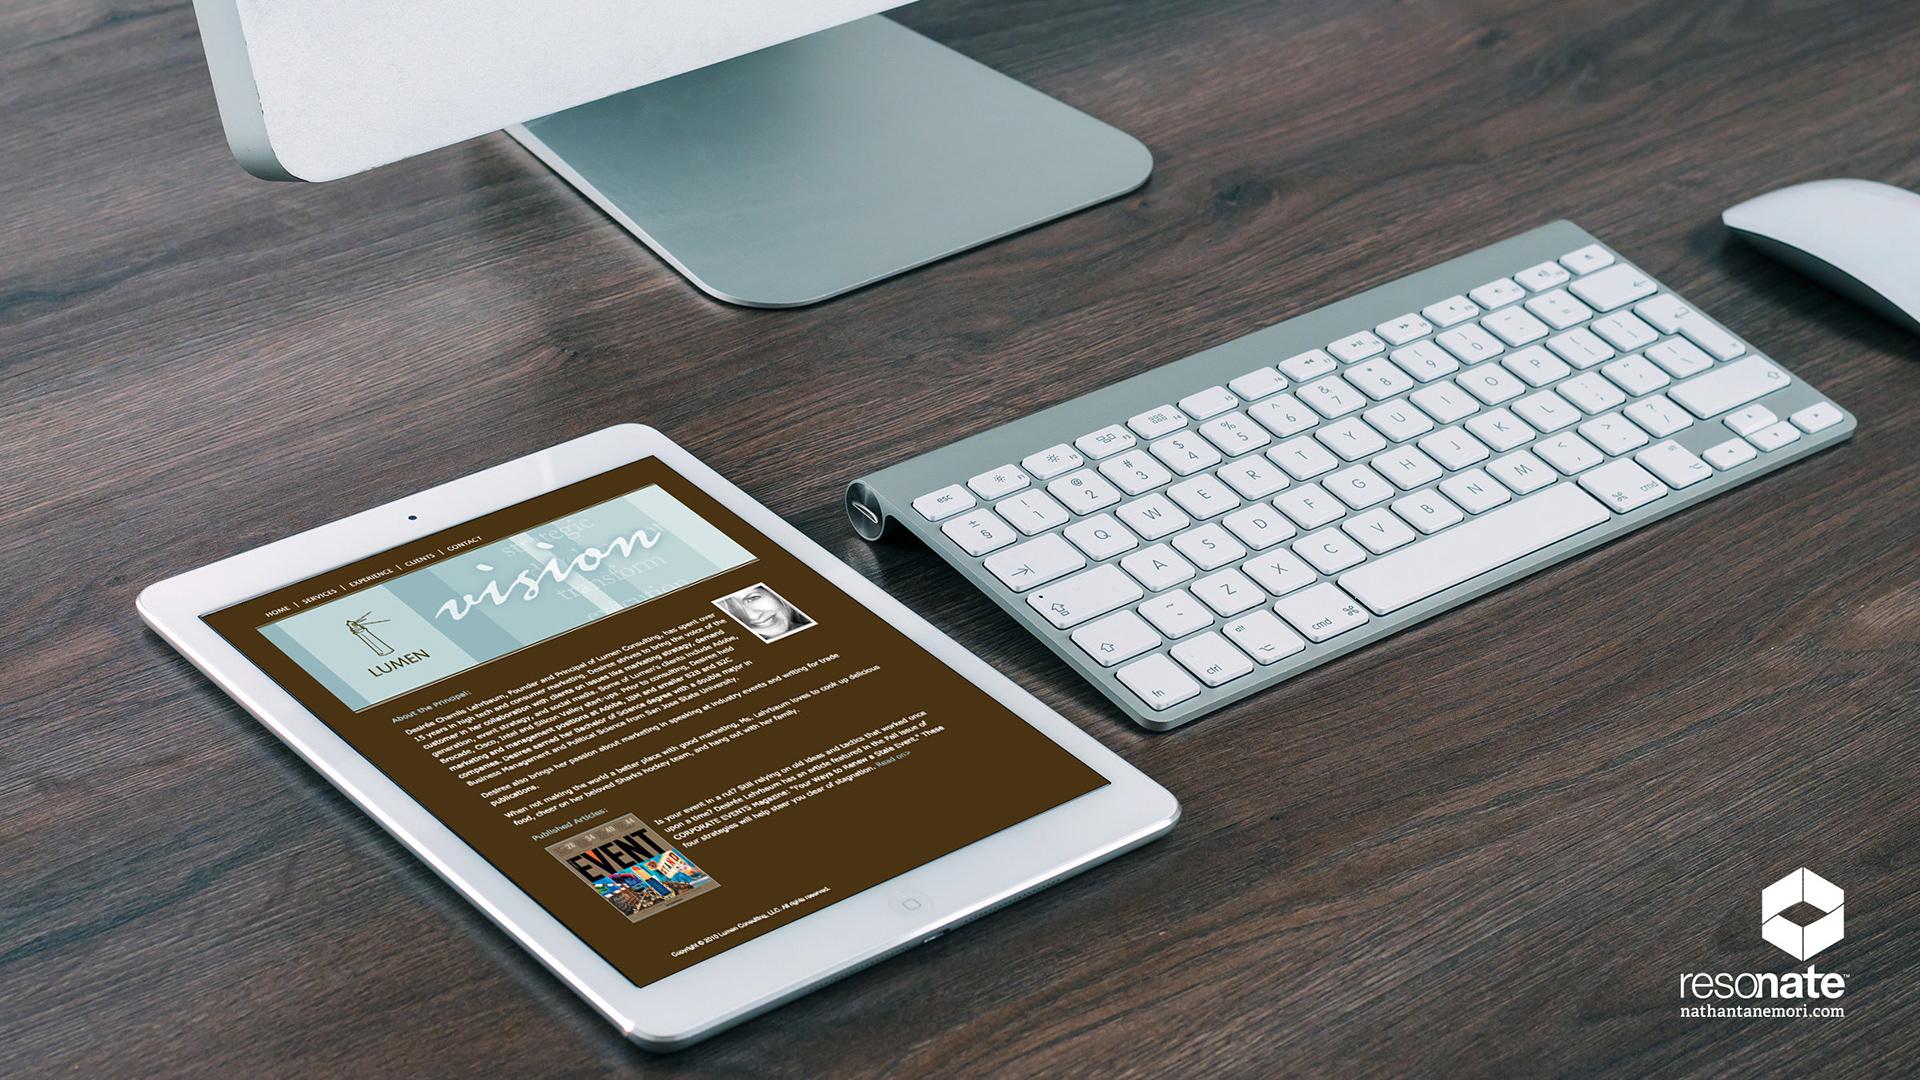 RESONATE | nathantanemori.com – inspired and intelligent design ...